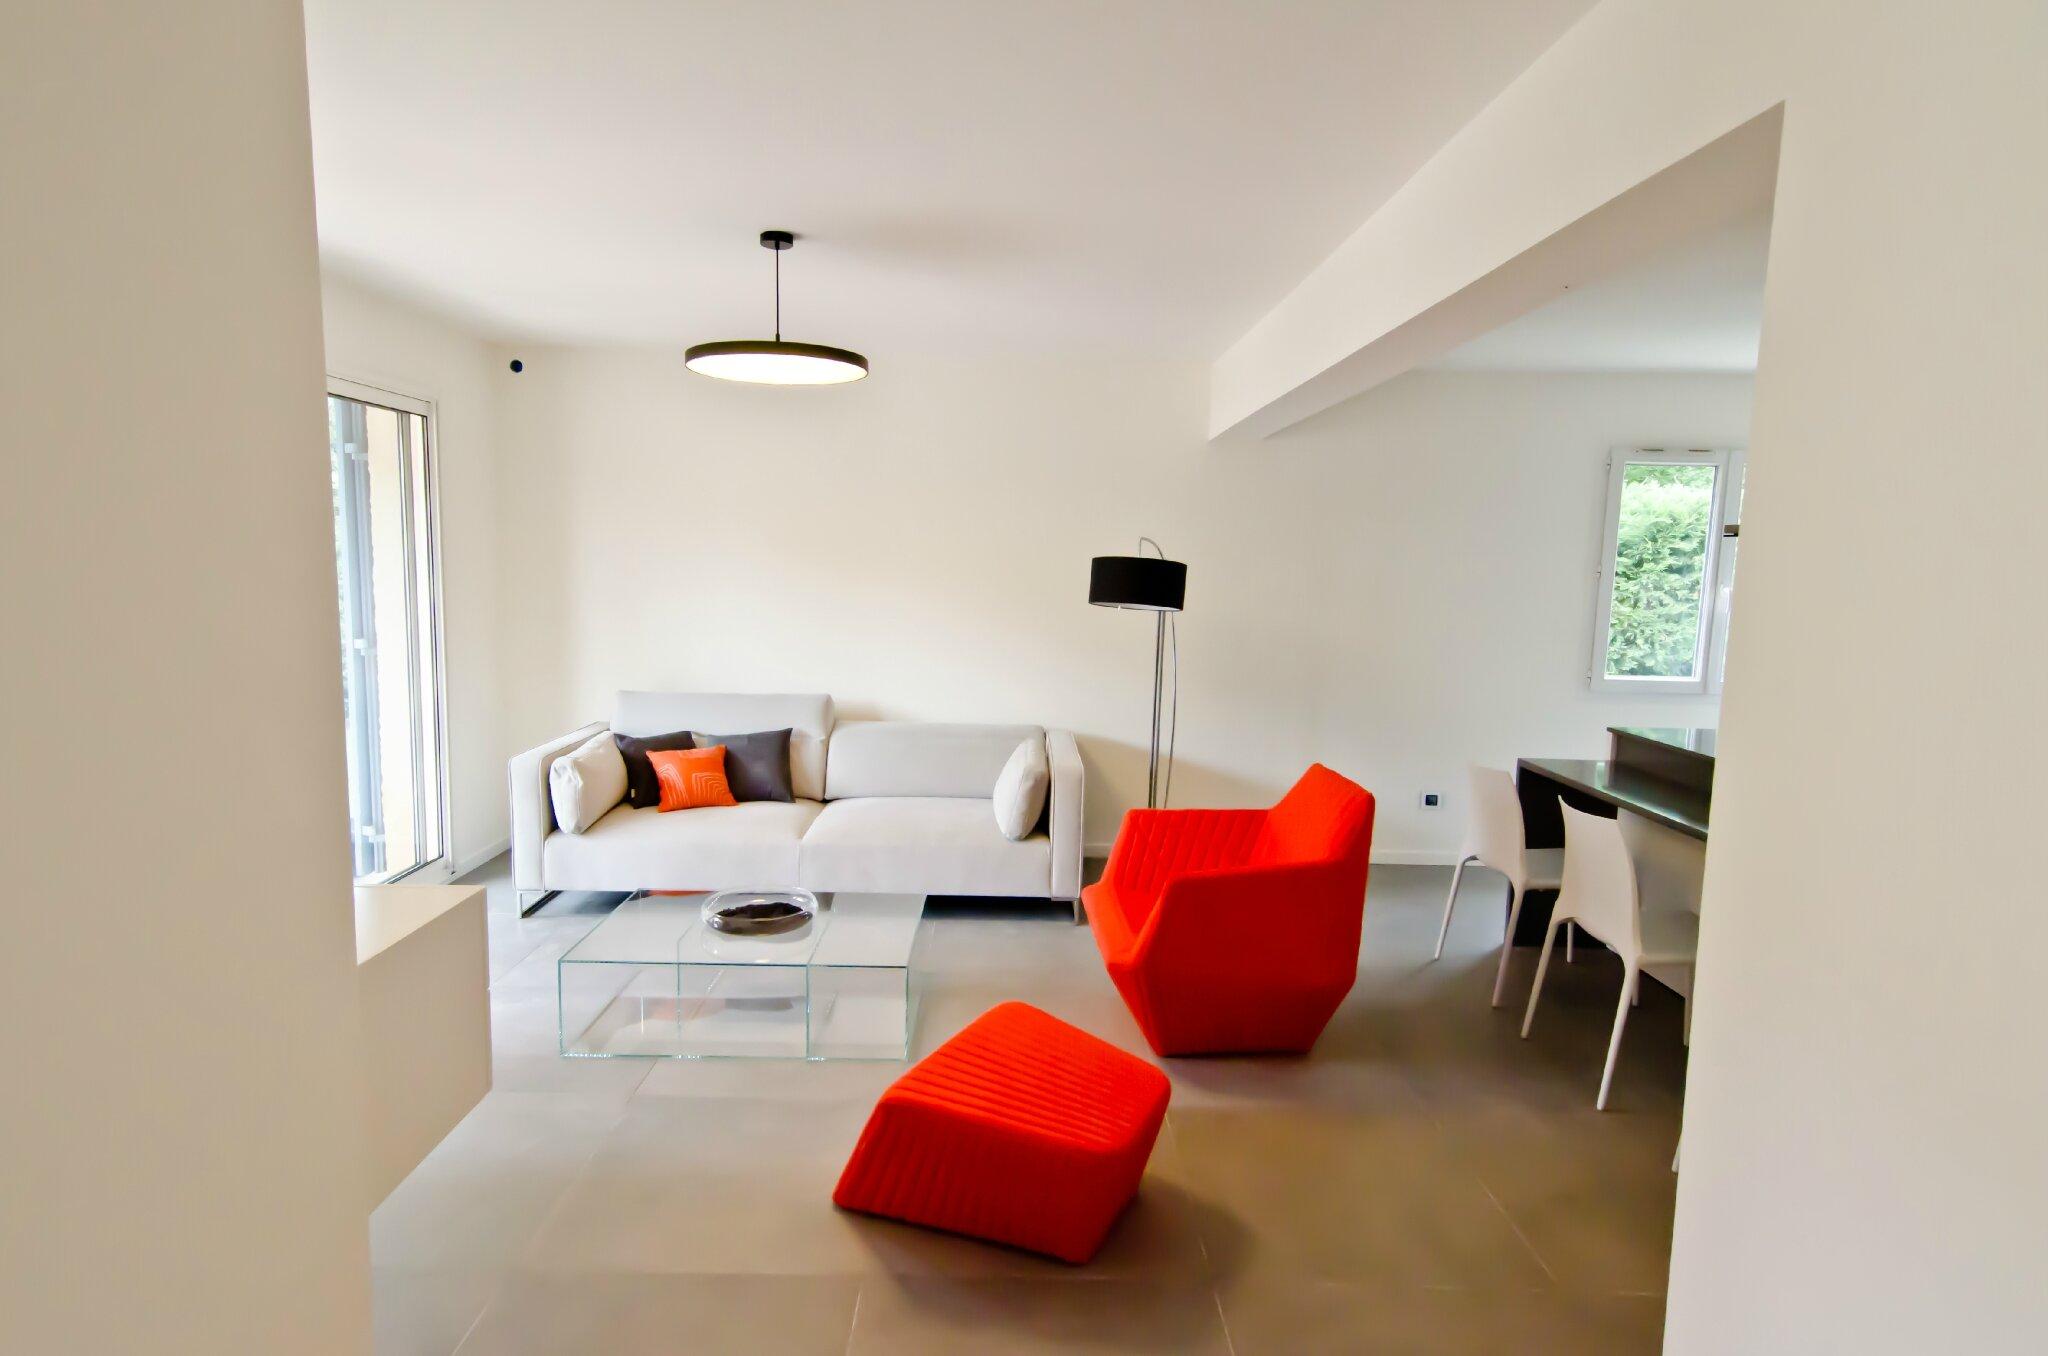 Espace Lounge Petit Salon Dappoint Stinside